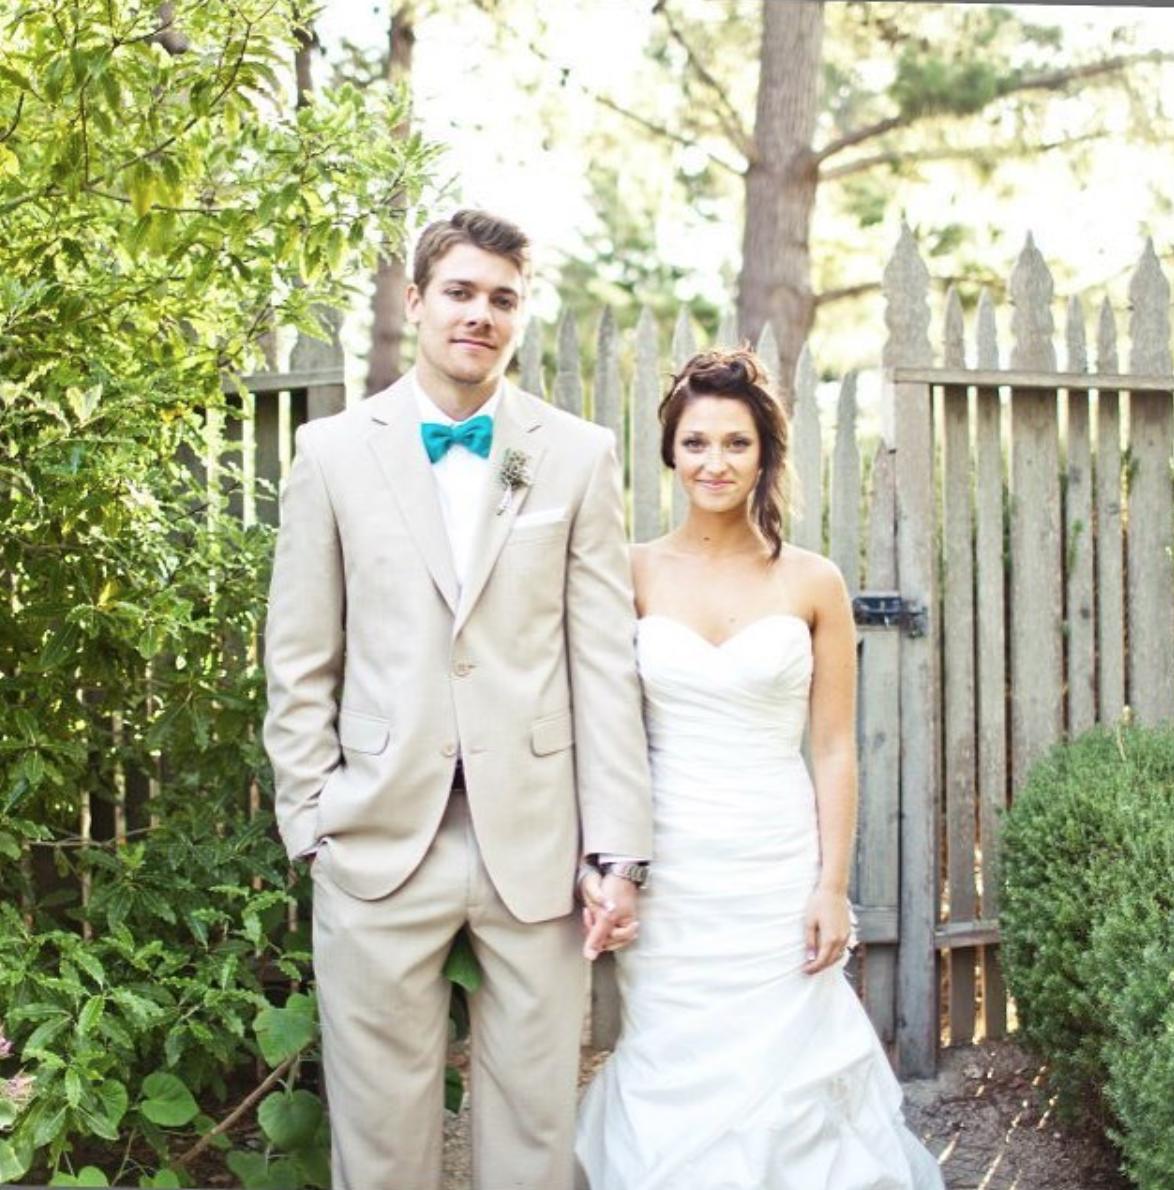 Joanna and Nolan on their wedding day